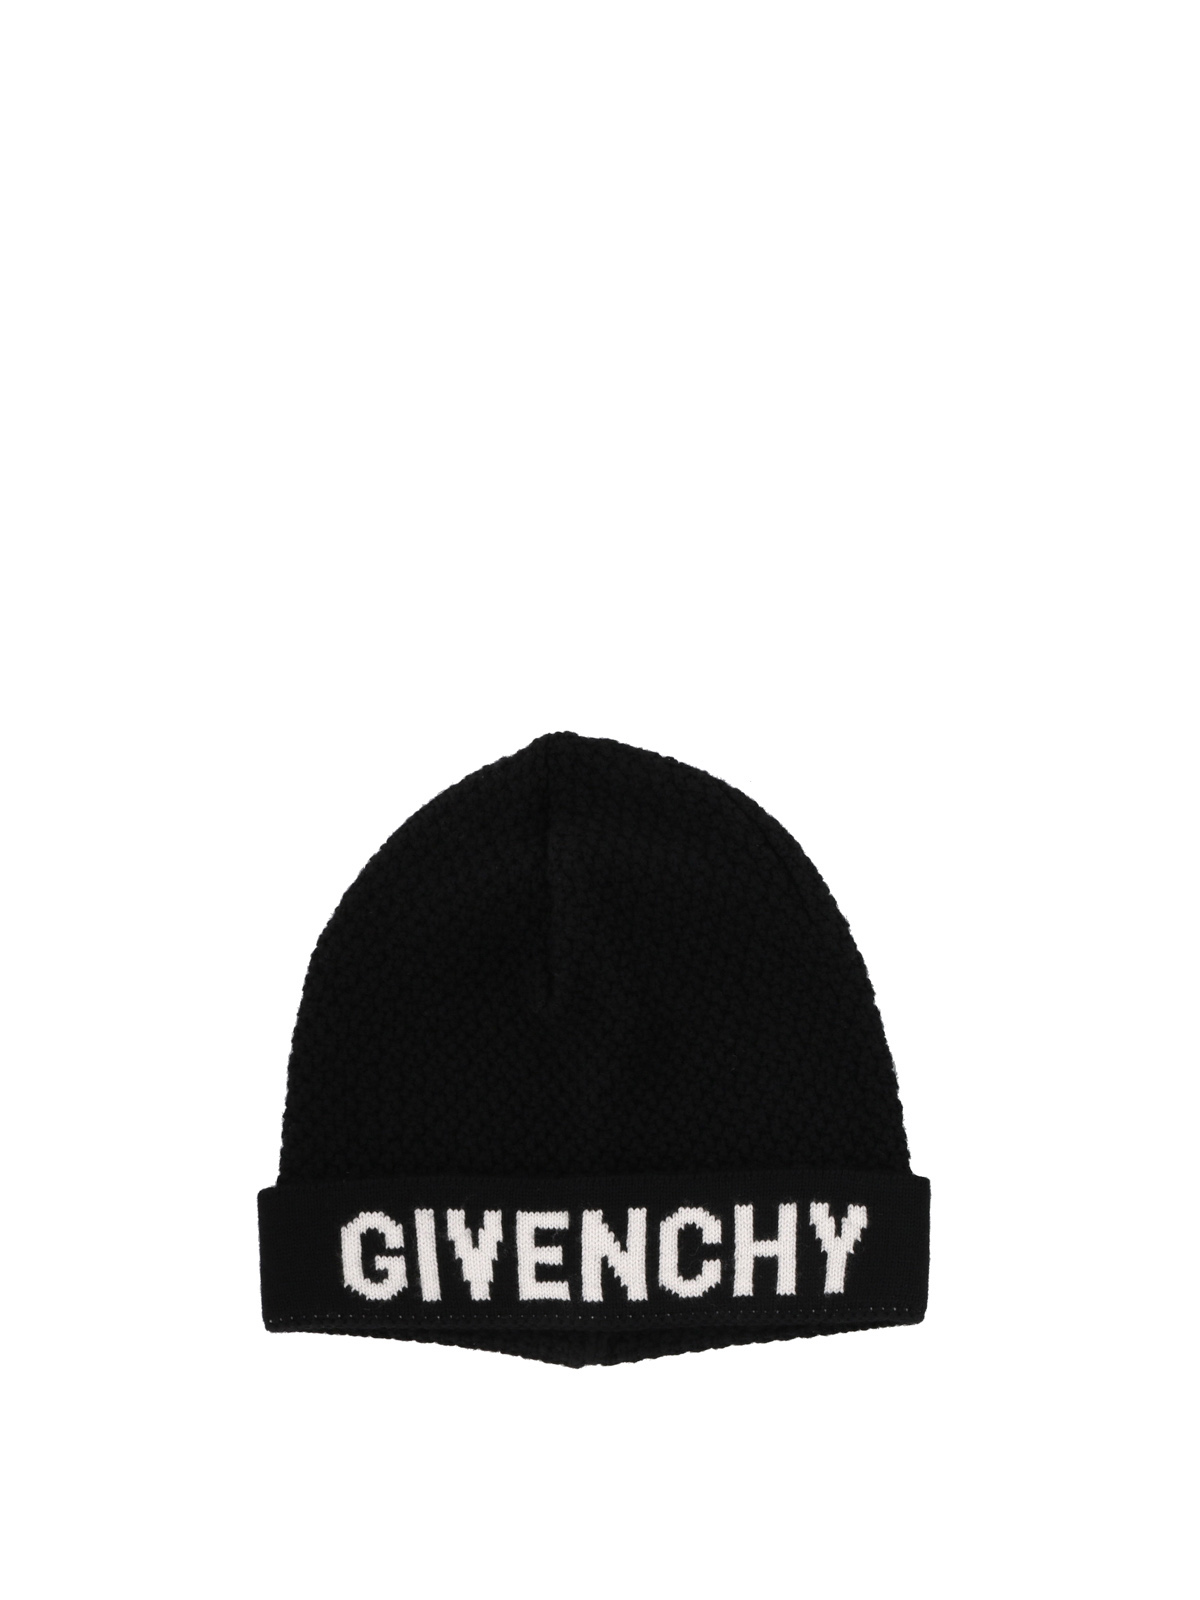 78f82023060 Givenchy - Black and white wool beanie - beanies - GWCAPPU13562